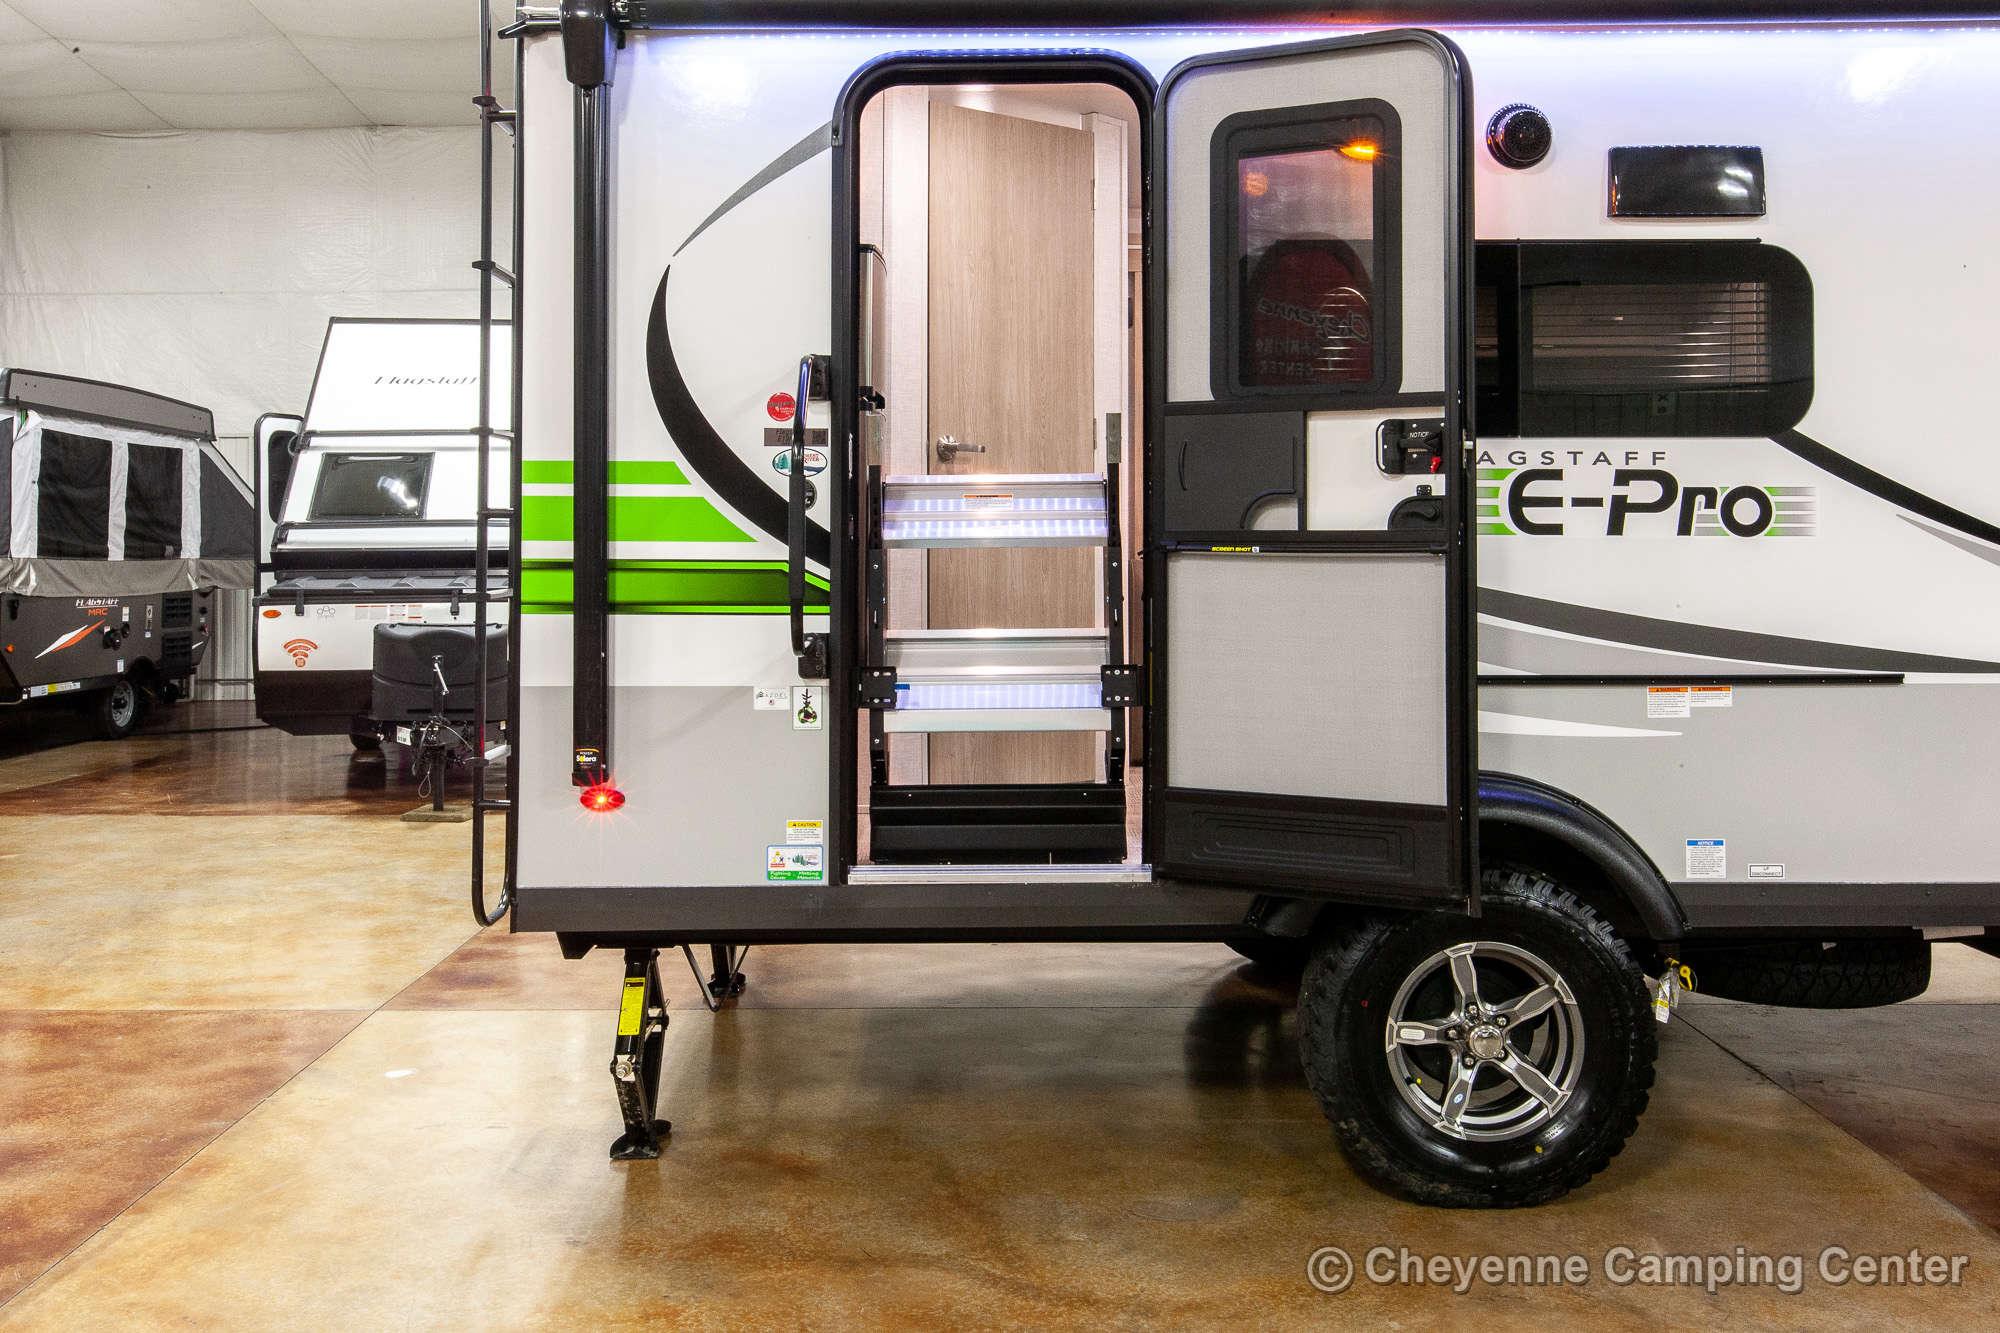 2021 Forest River Flagstaff E-Pro E19FBS Travel Trailer Exterior Image